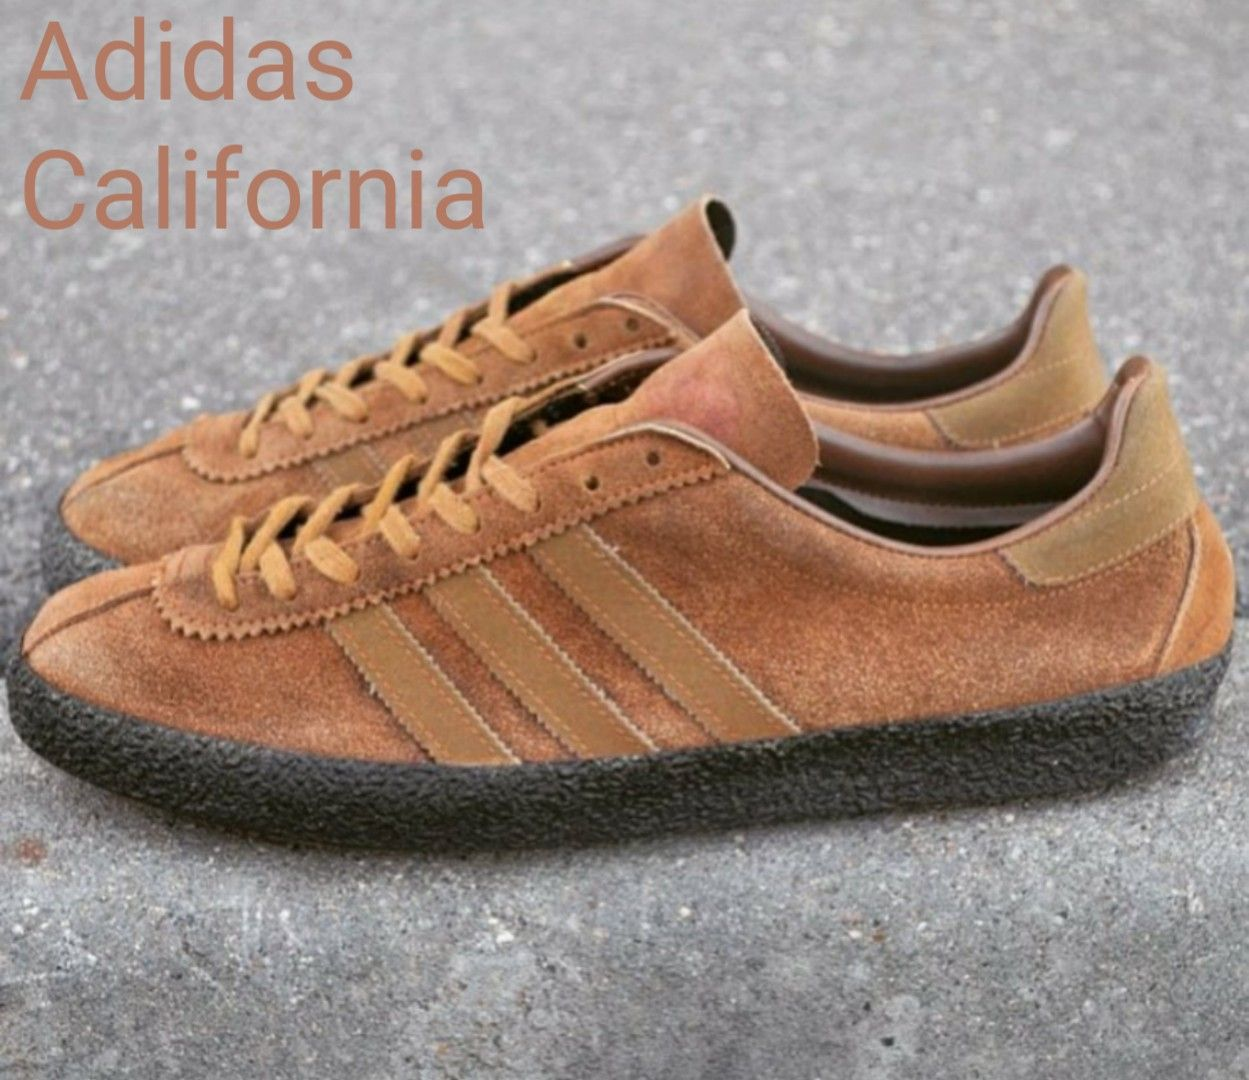 Stunning pair of vintage Adidas California these beauties